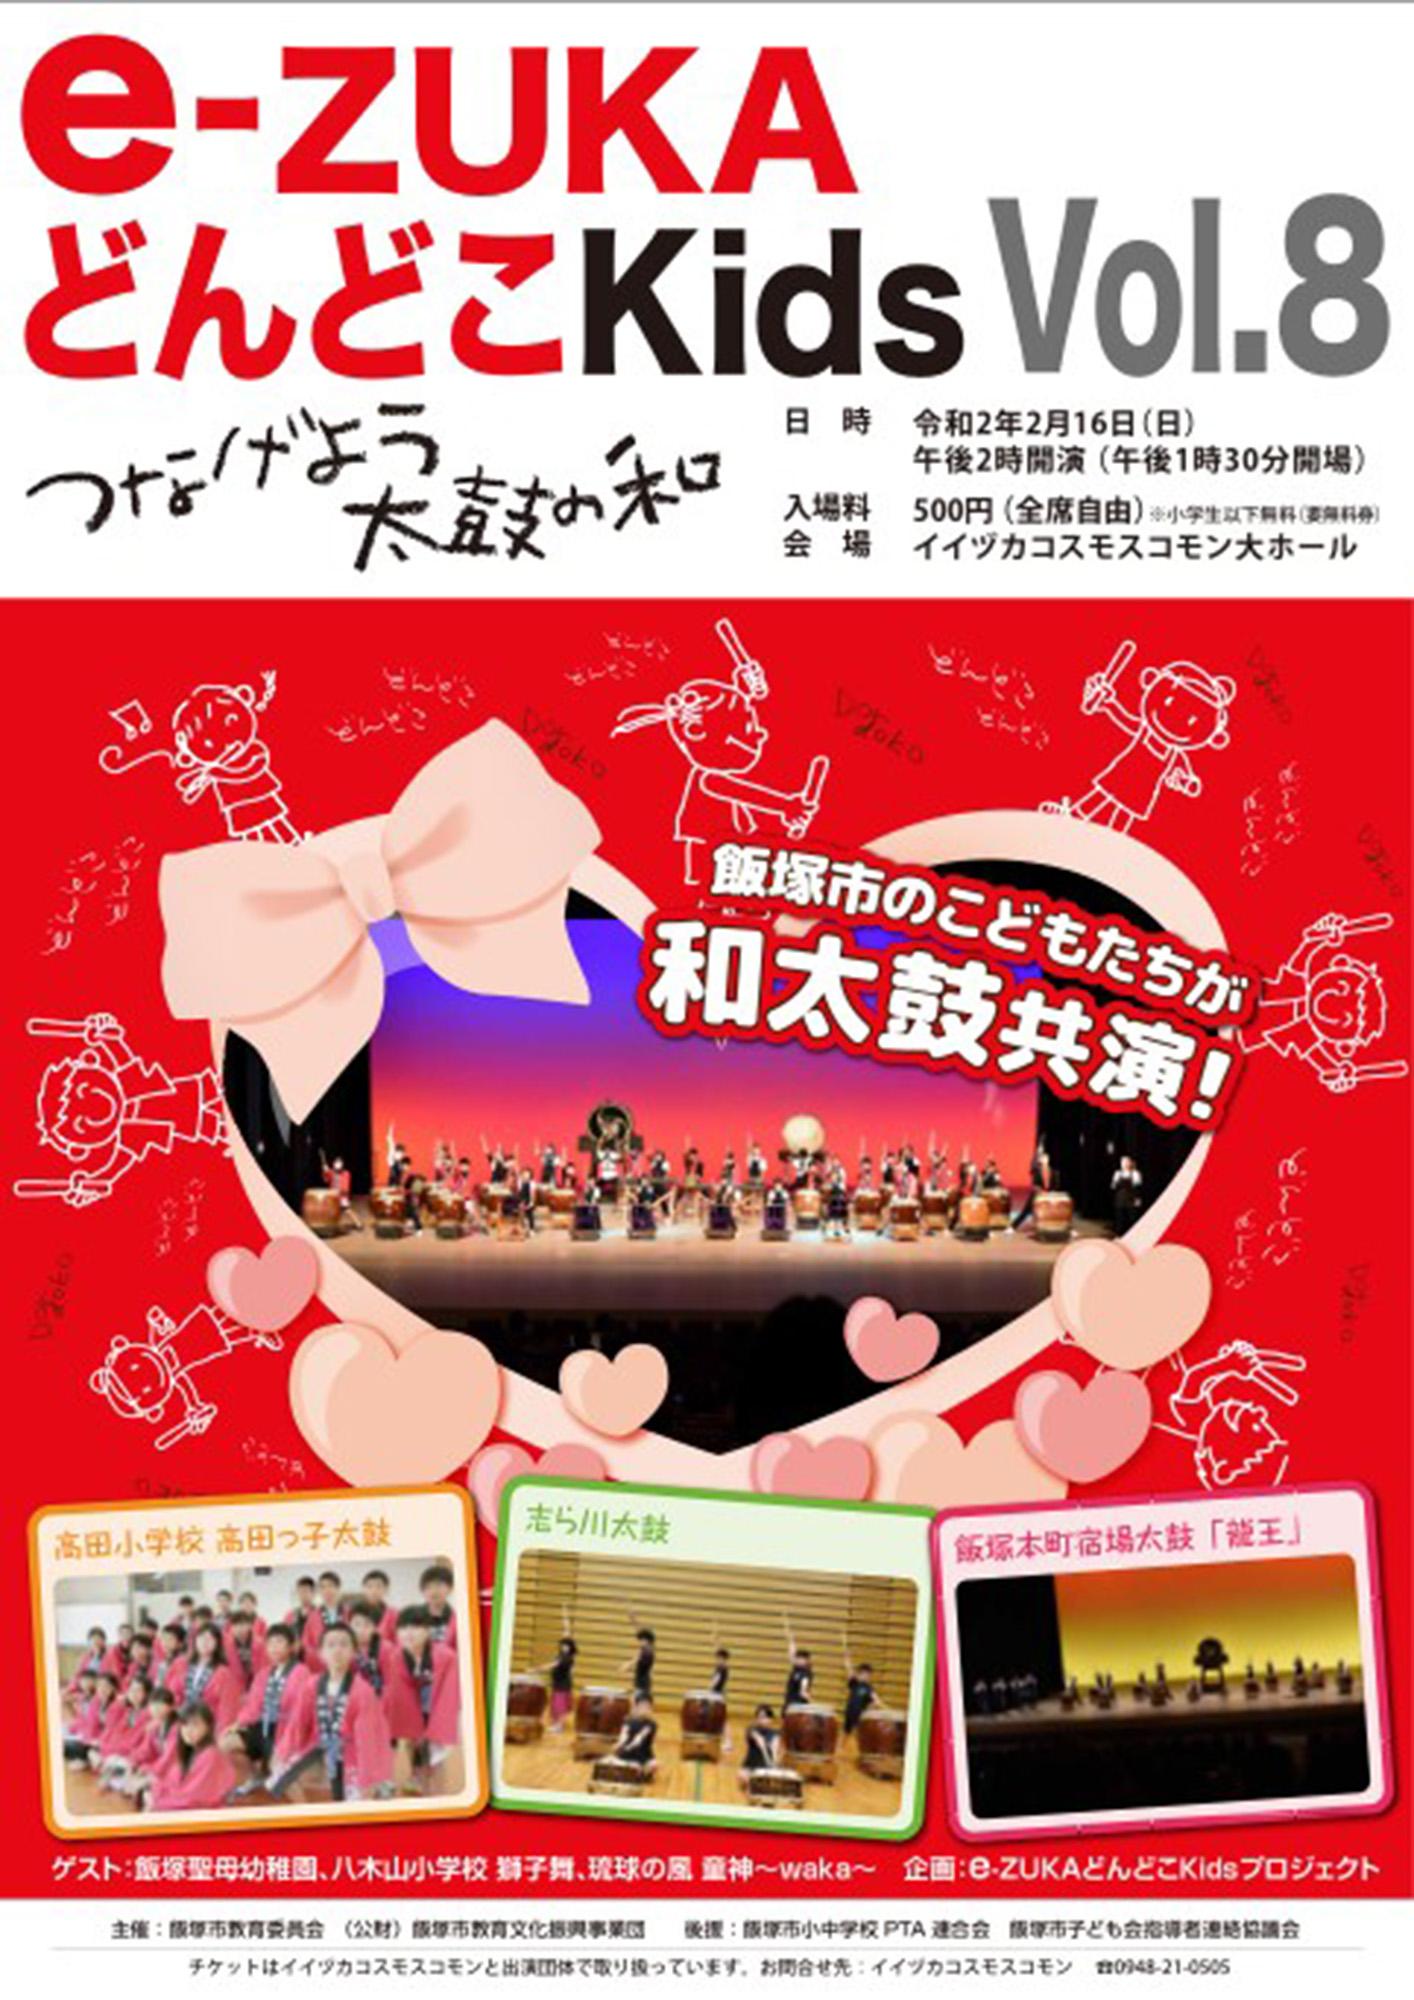 e-ZUKA どんどこキッズ Vol.8